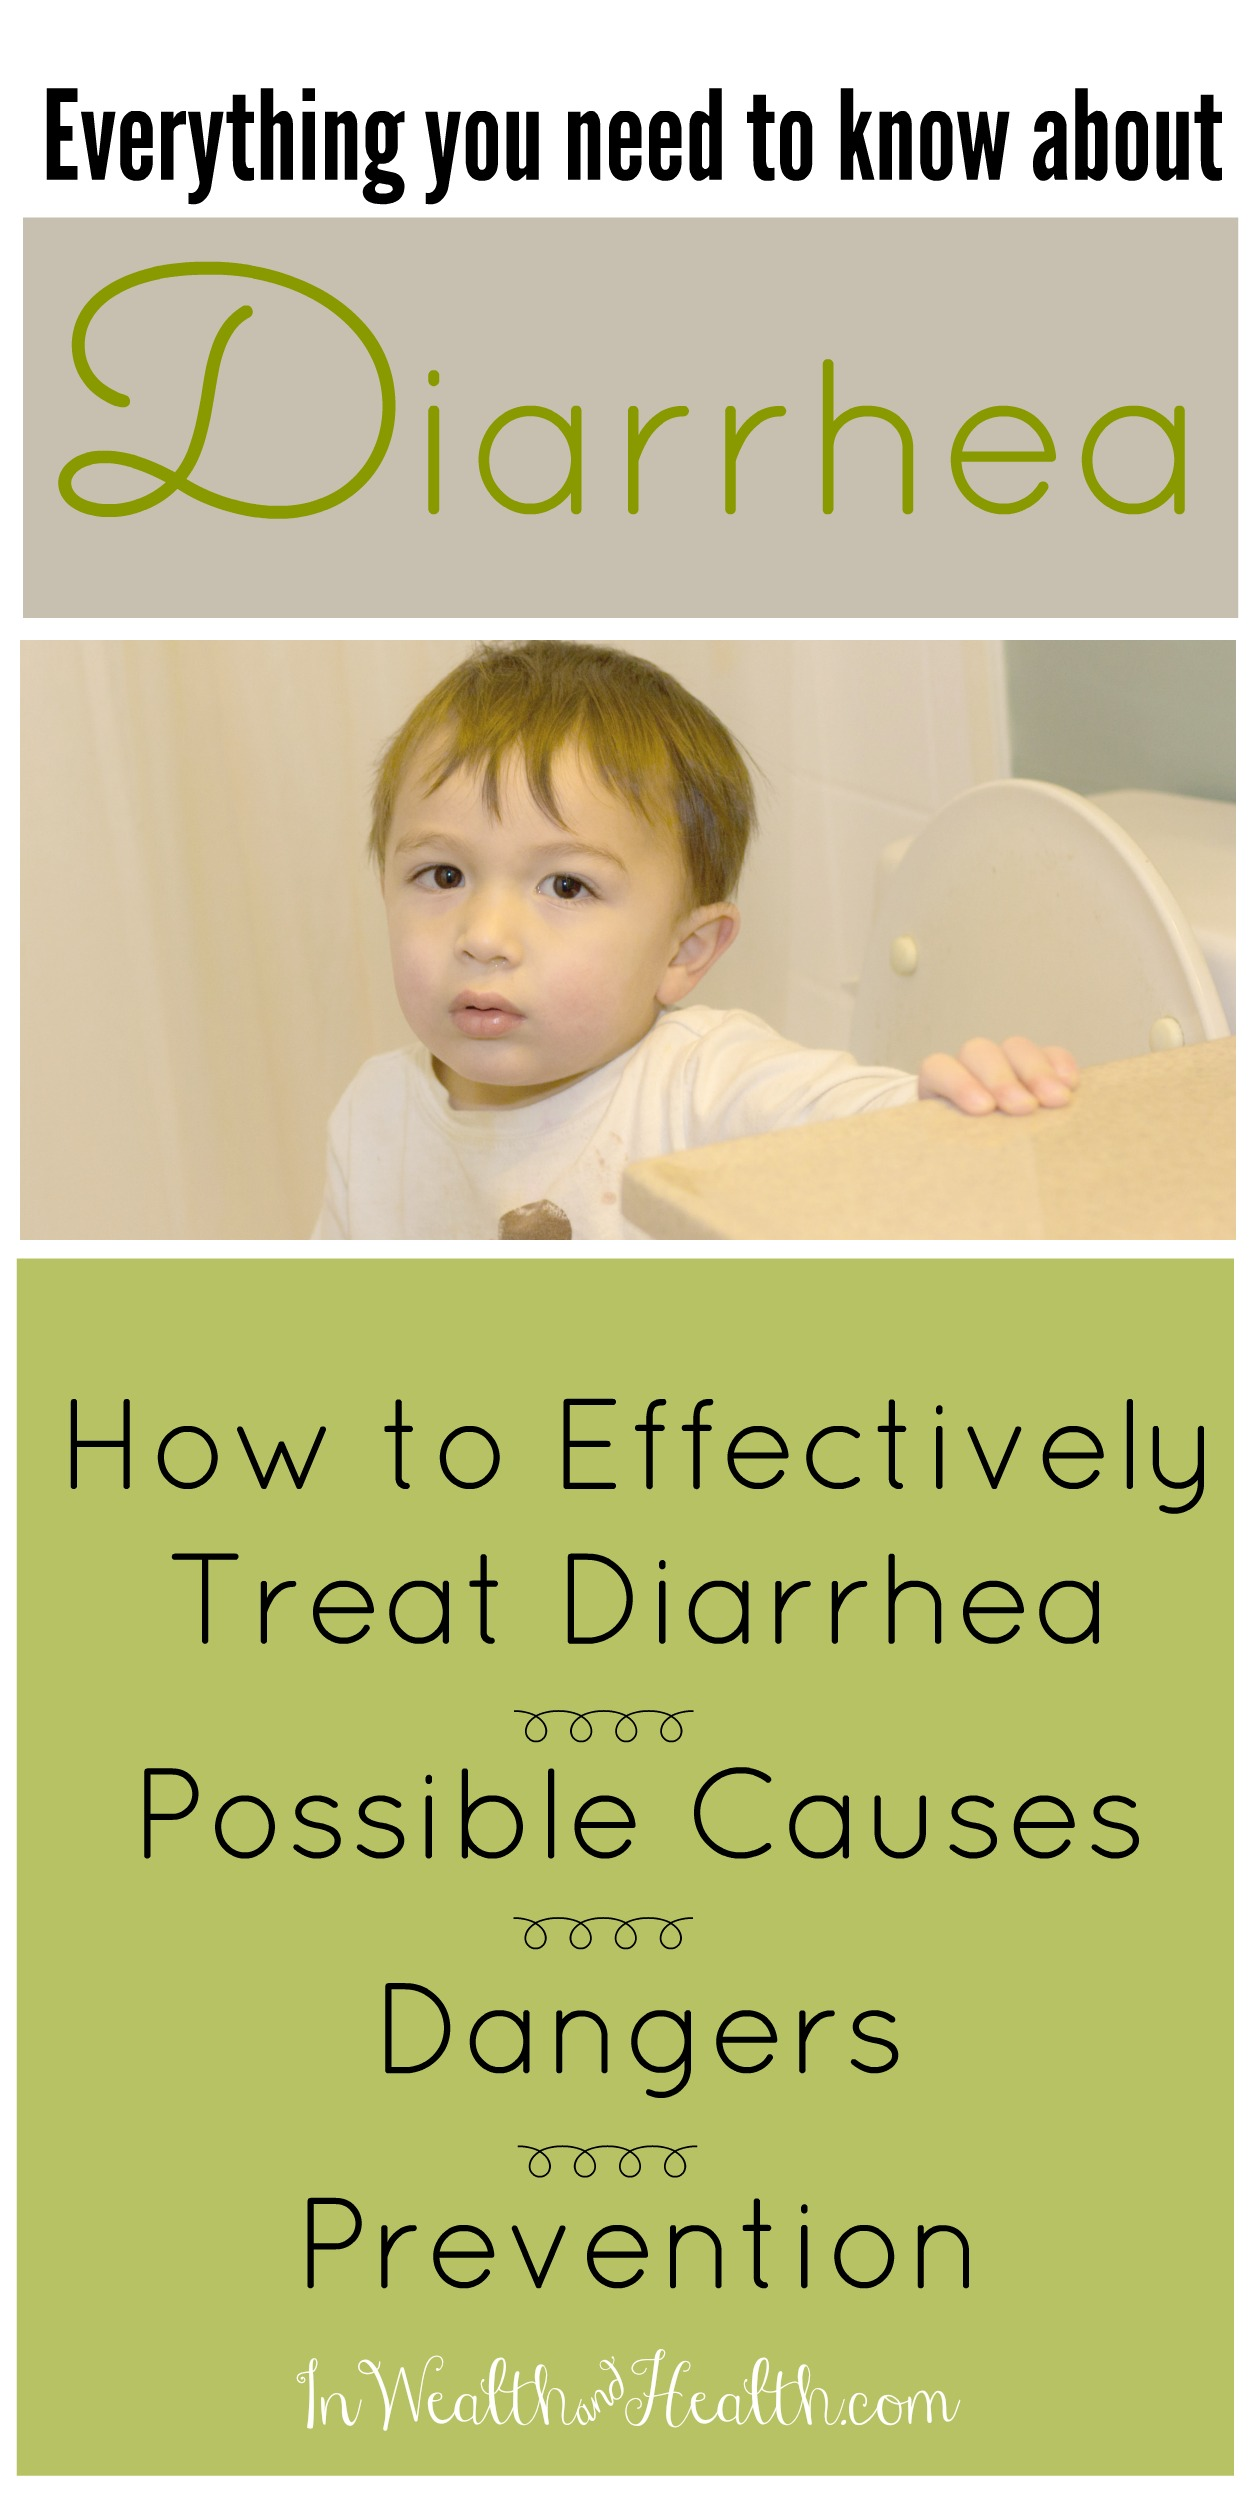 Diarrhea Remedies, Causes, Dangers & Prevention Tips